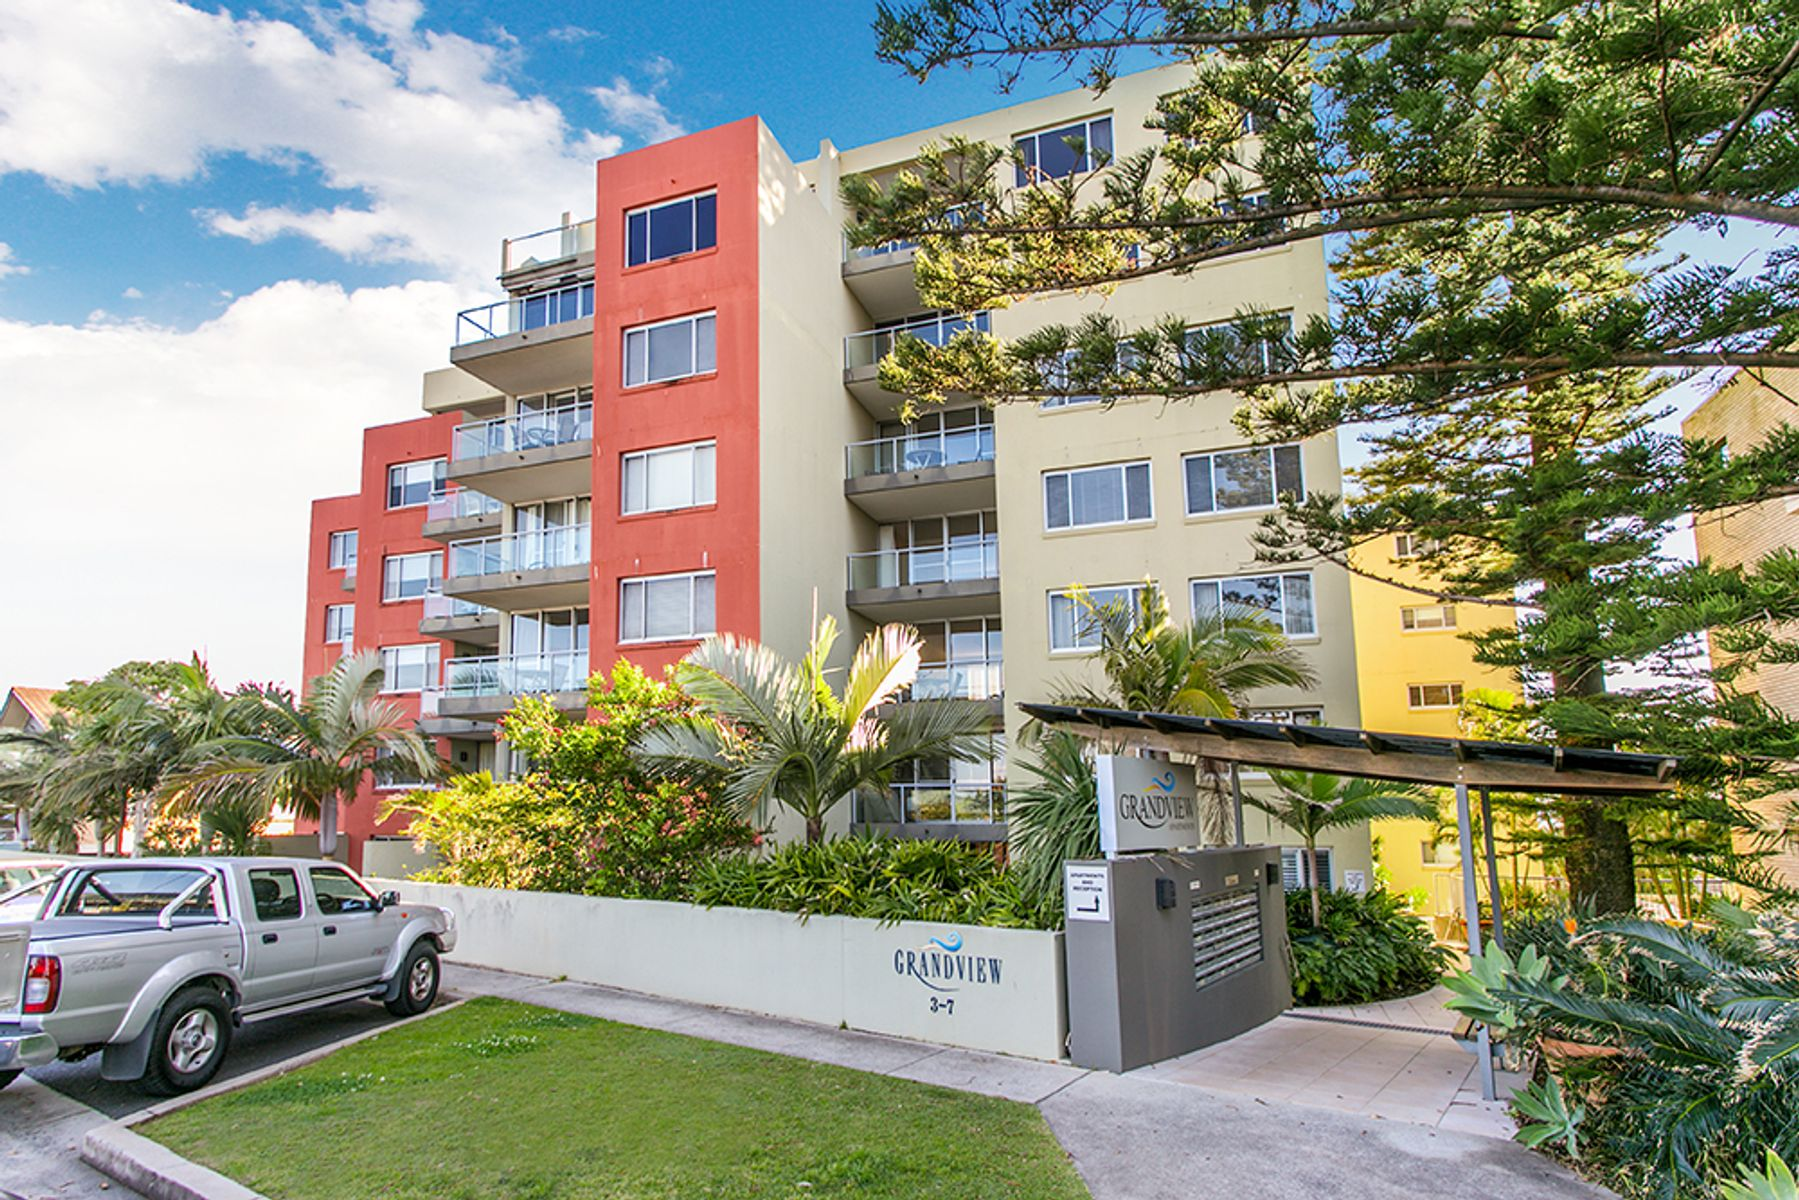 304/3-7 Grandview Street, East Ballina, NSW 2478